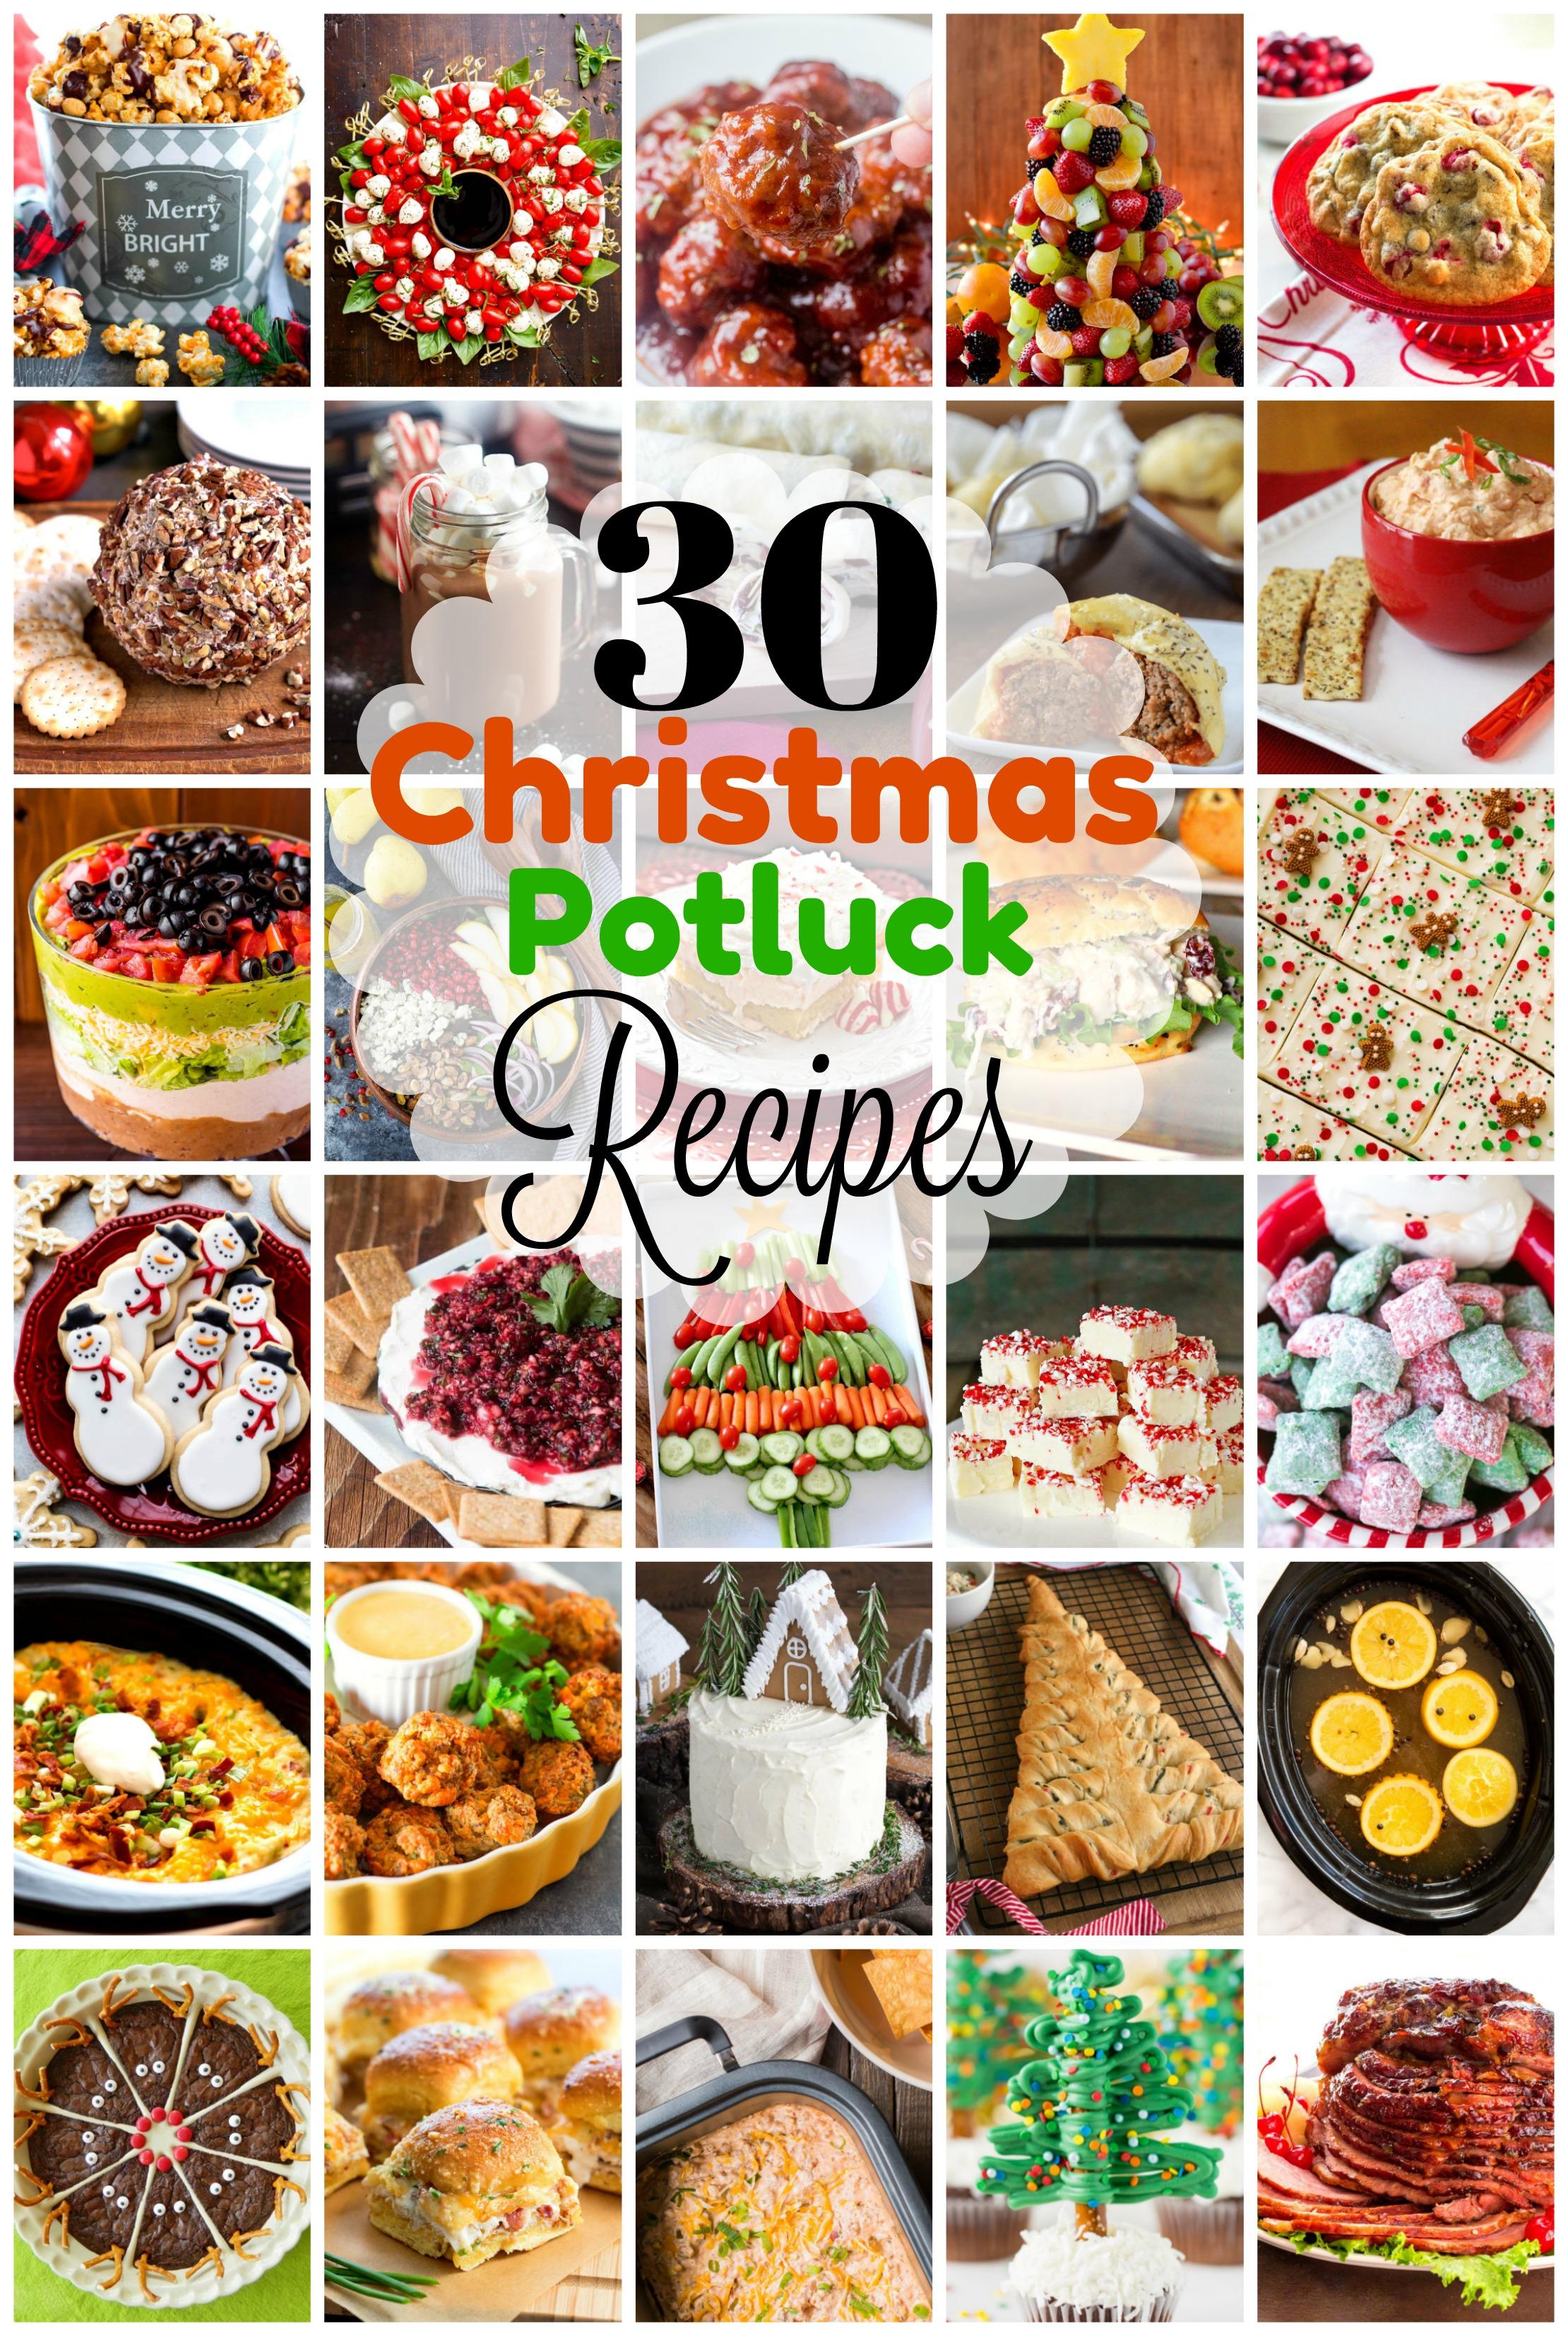 Christmas Potluck.30 Festive Dishes To Take To A Christmas Potluck